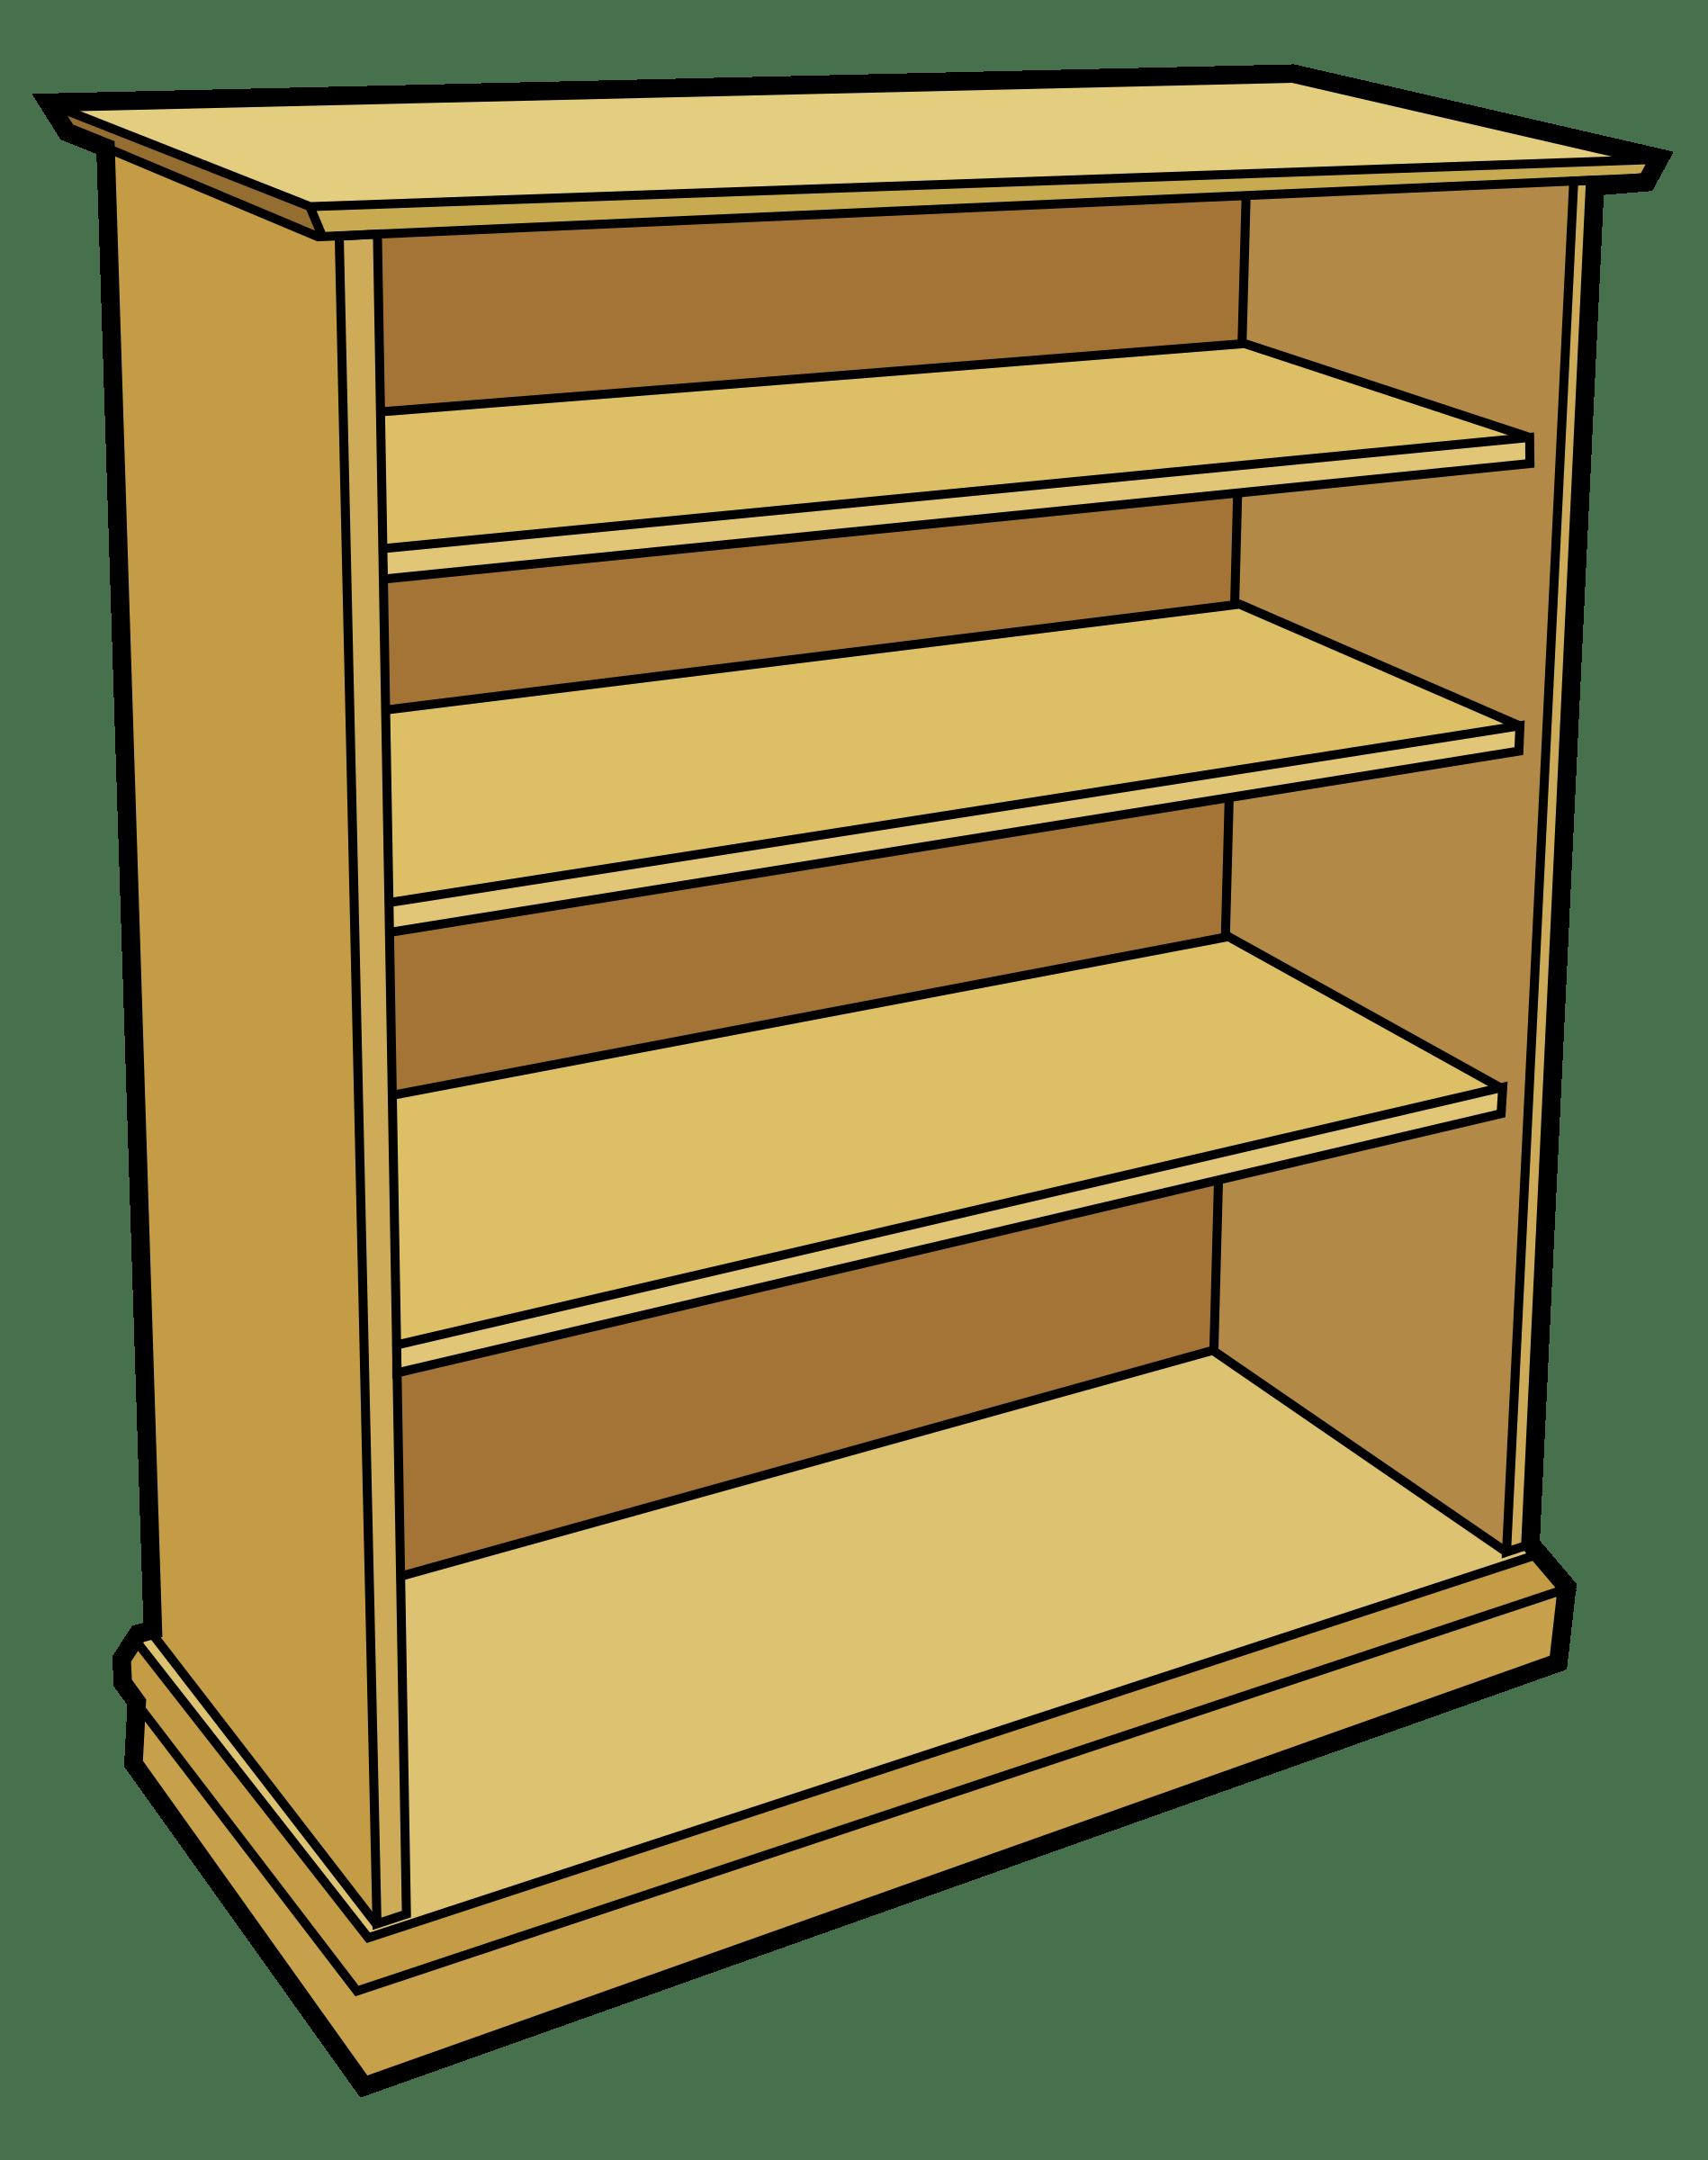 svg transparent stock Bookshelf clipart. Bookcase wooden furniture pencil.